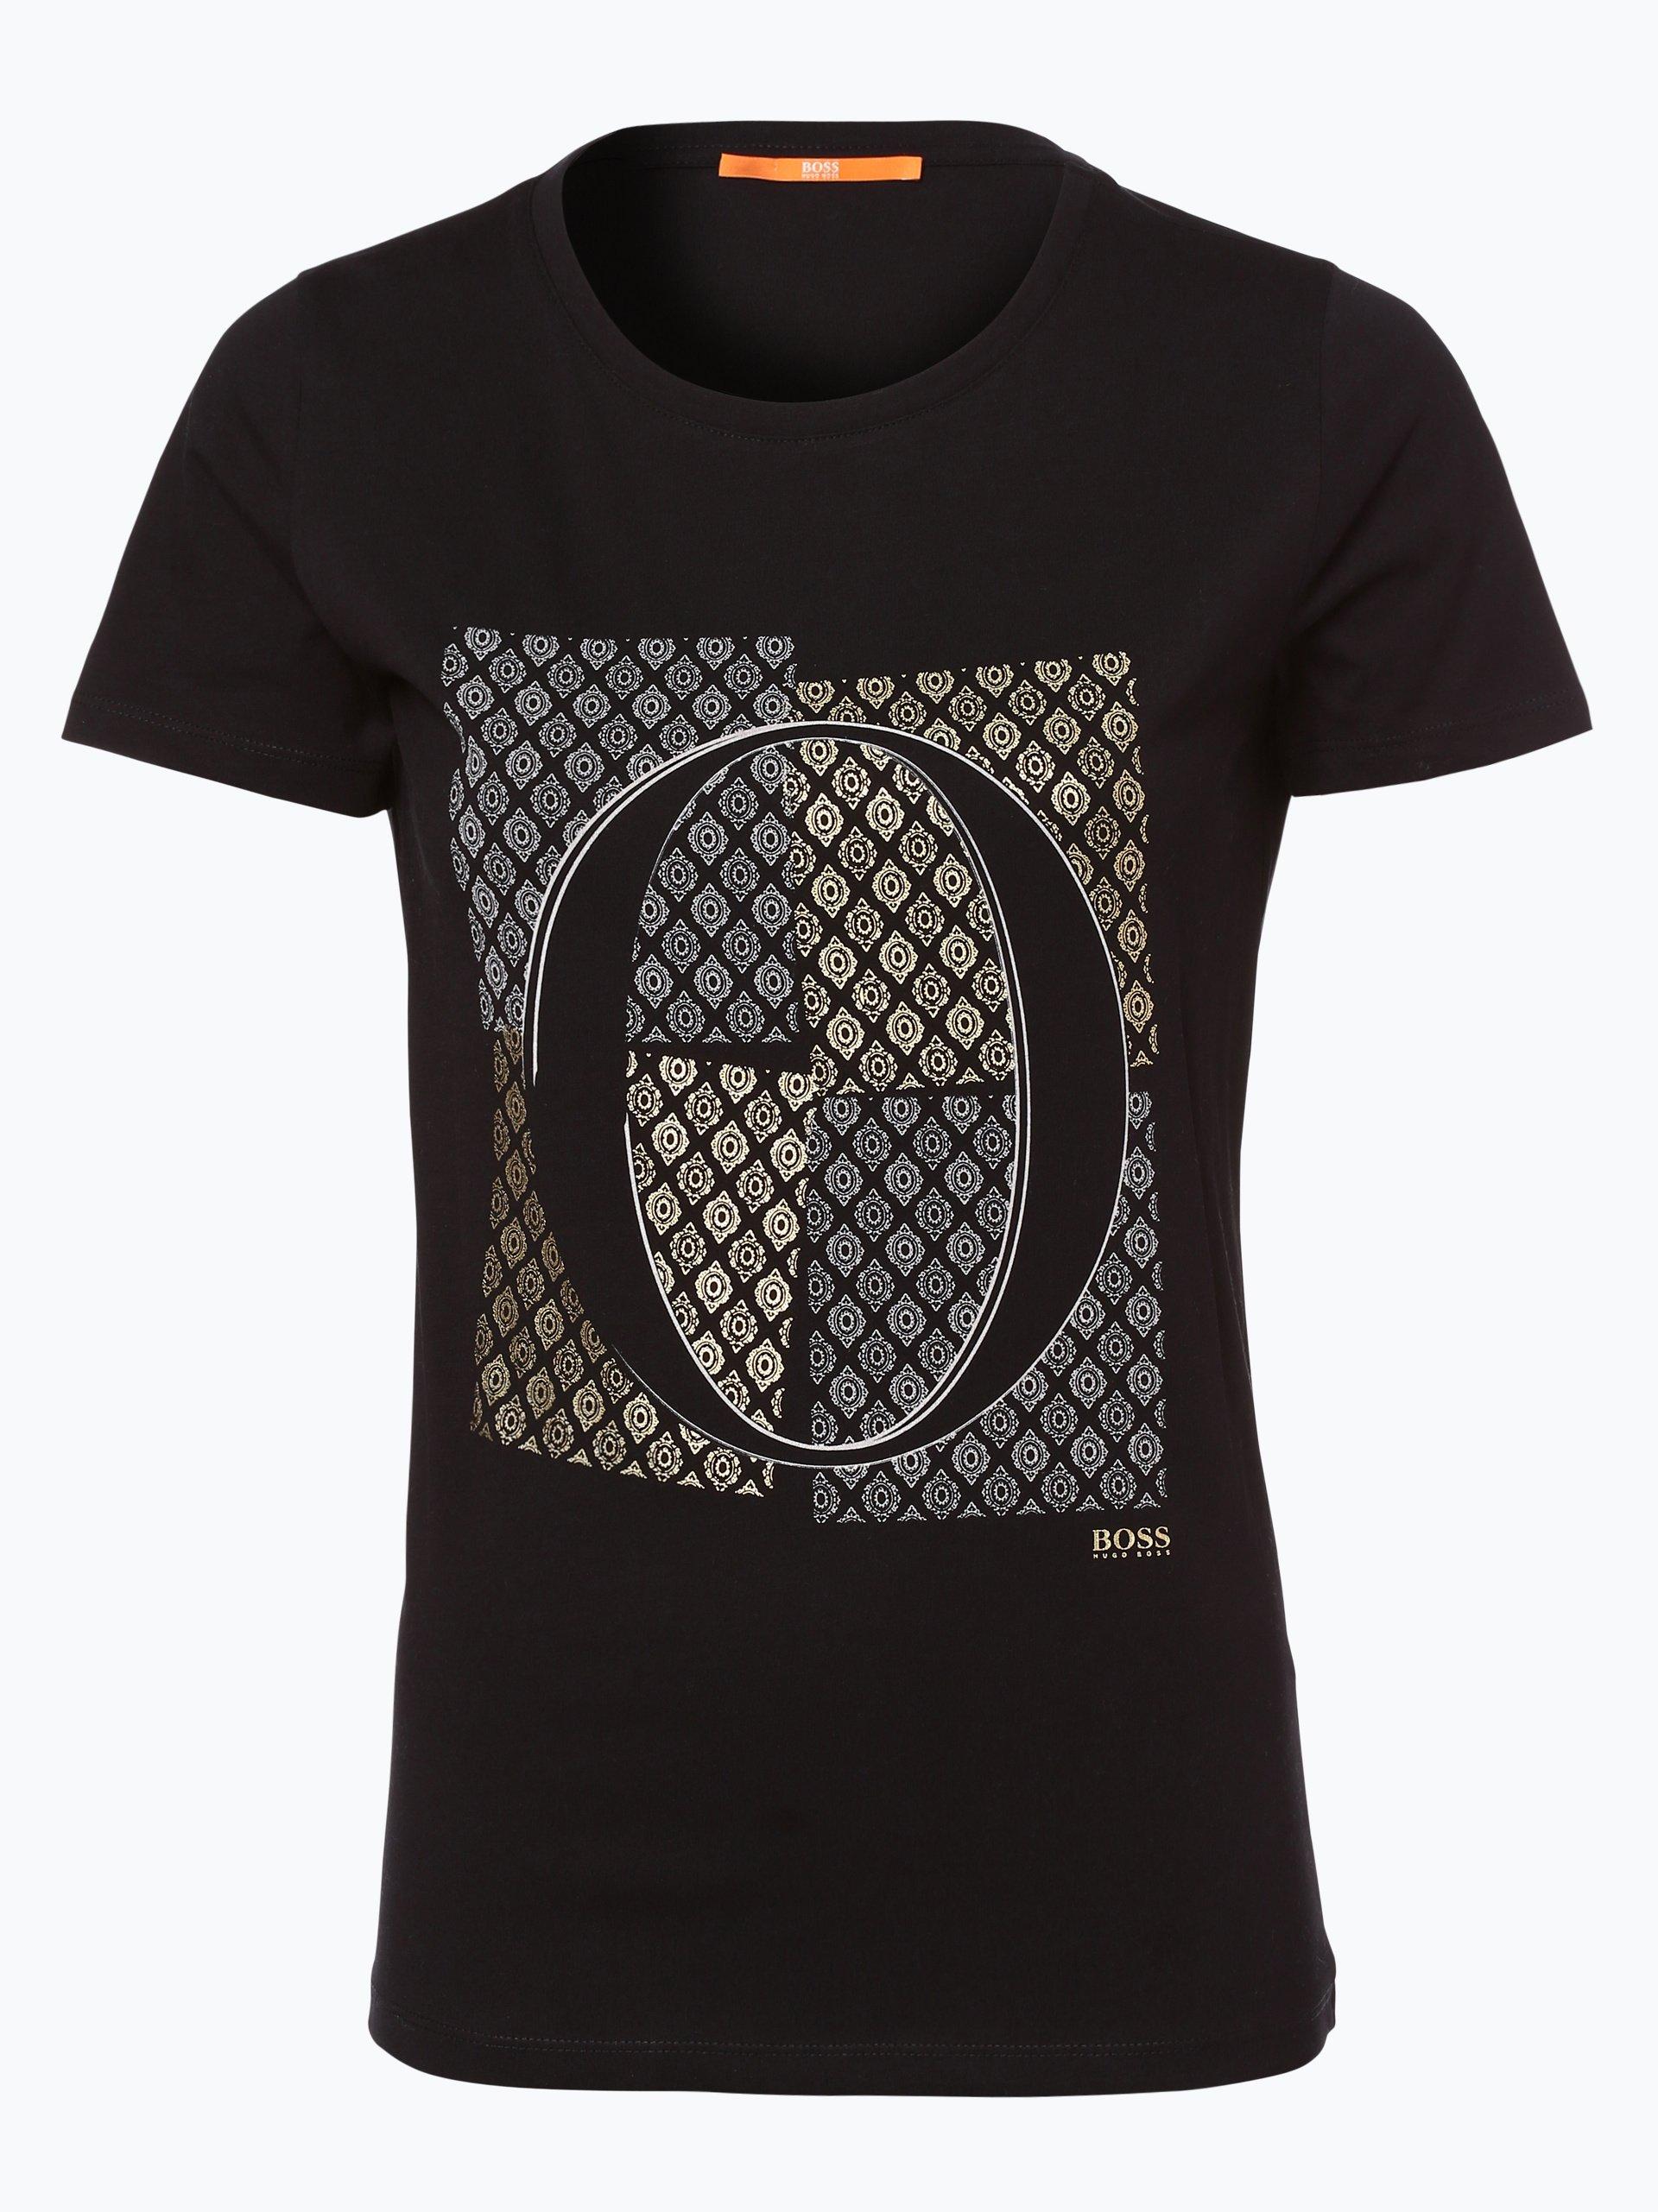 BOSS Casual Damen T-Shirt - Tushirti